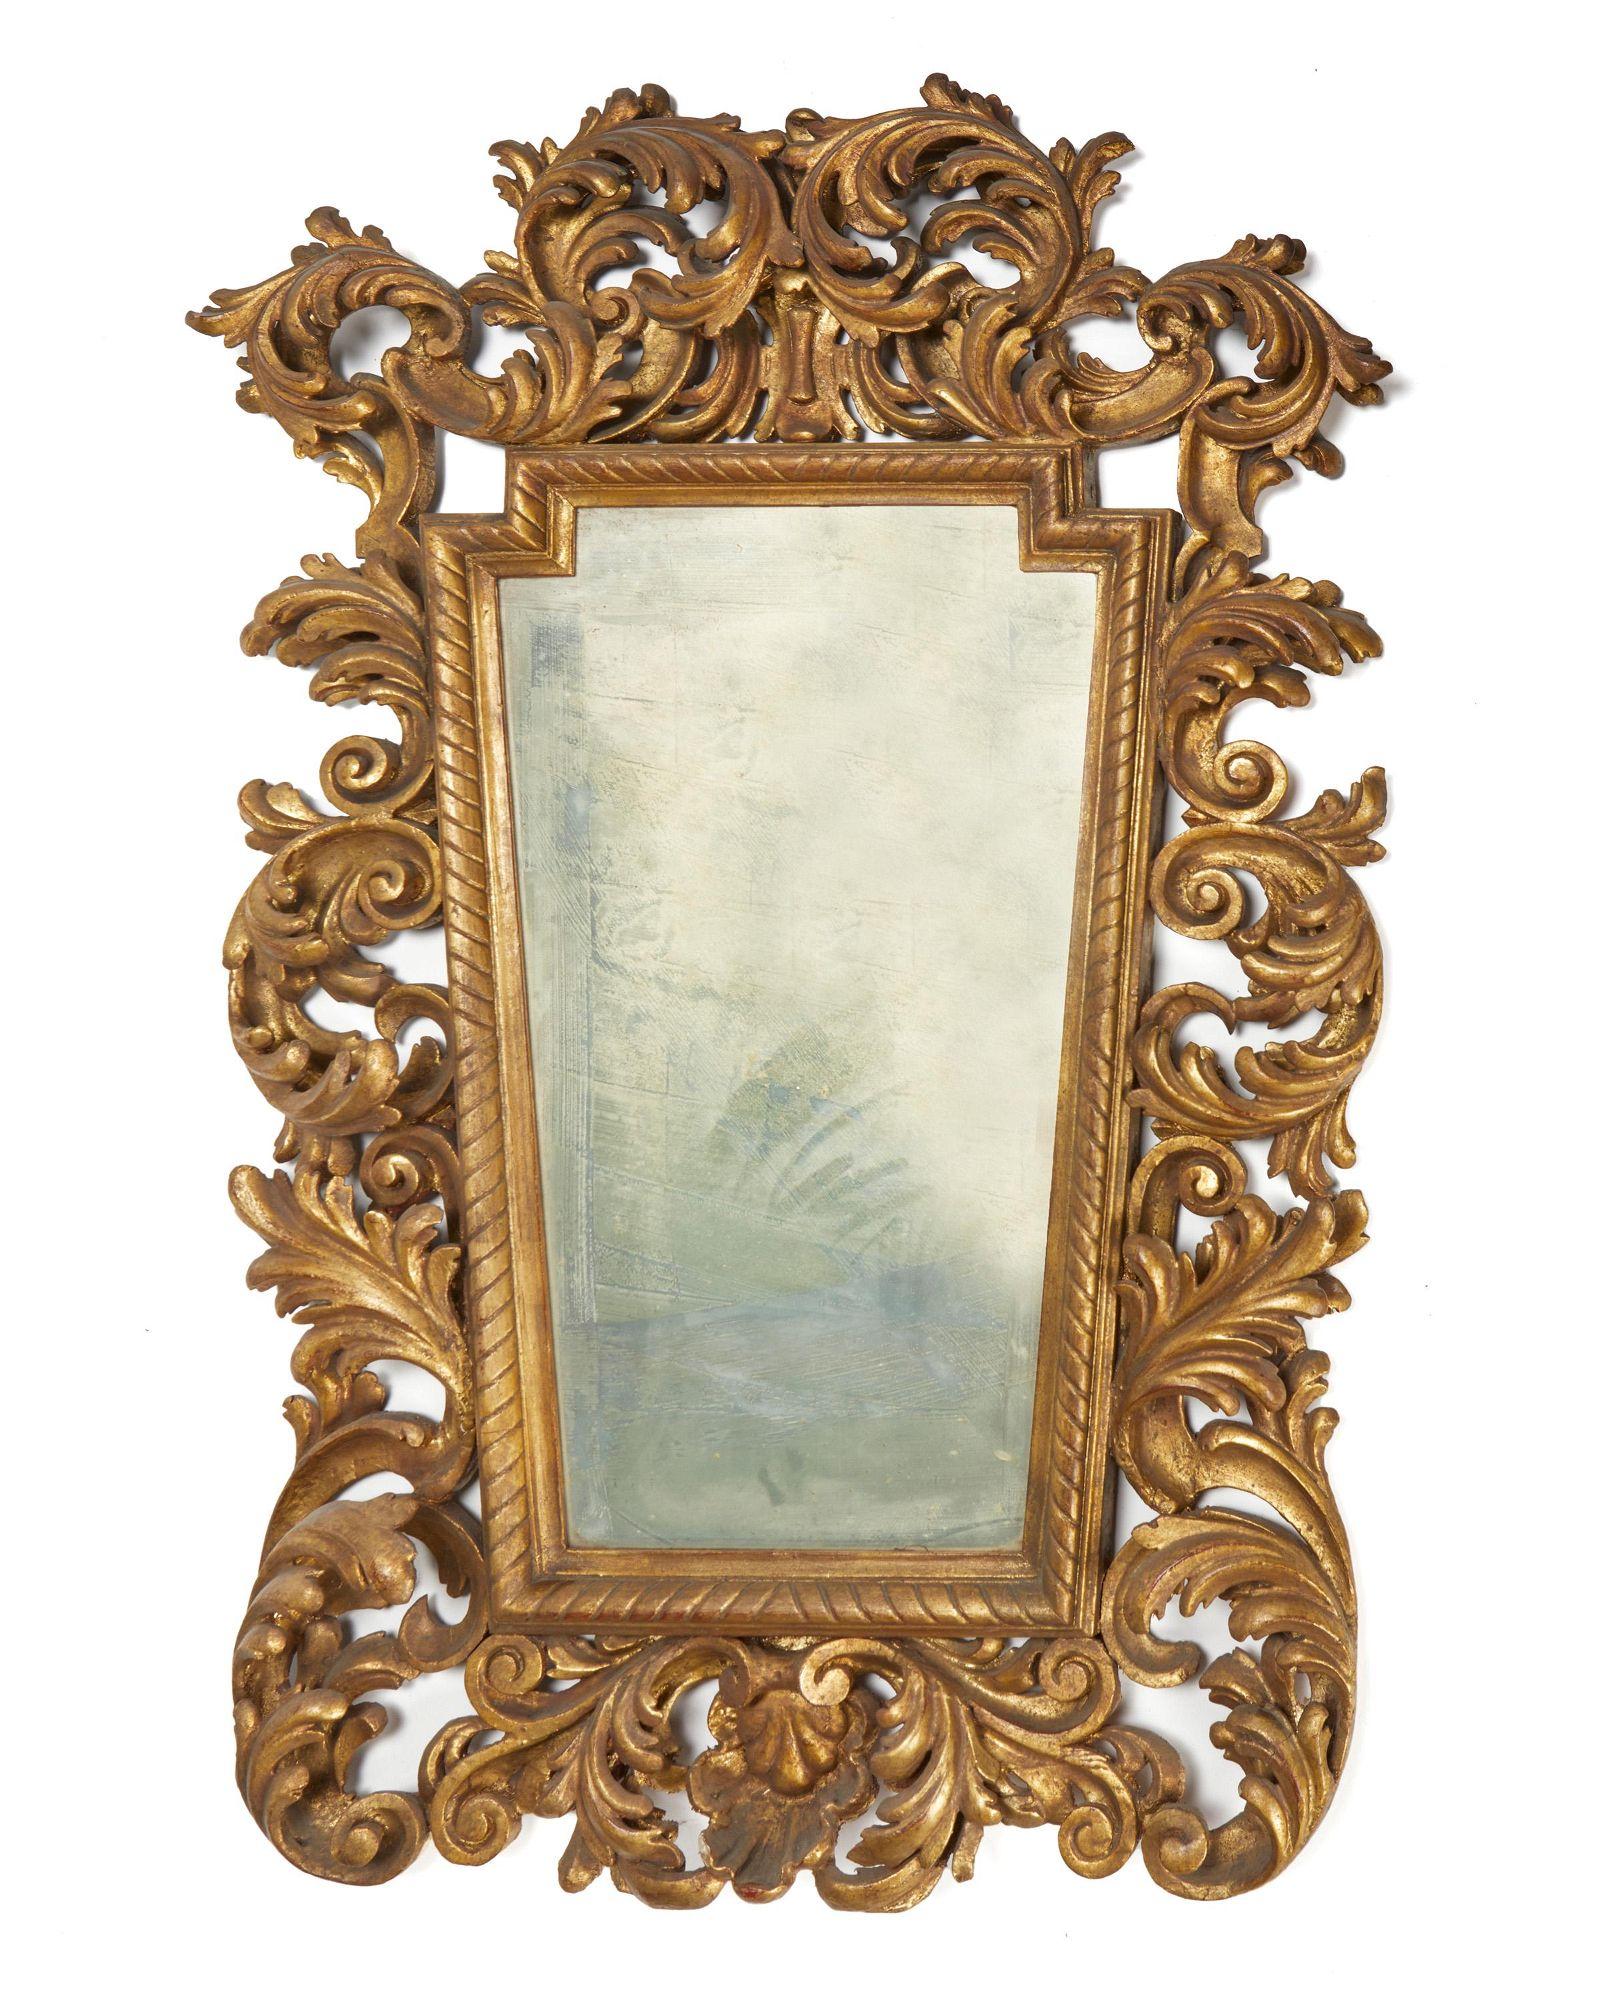 An Italian carved giltwood wall mirror